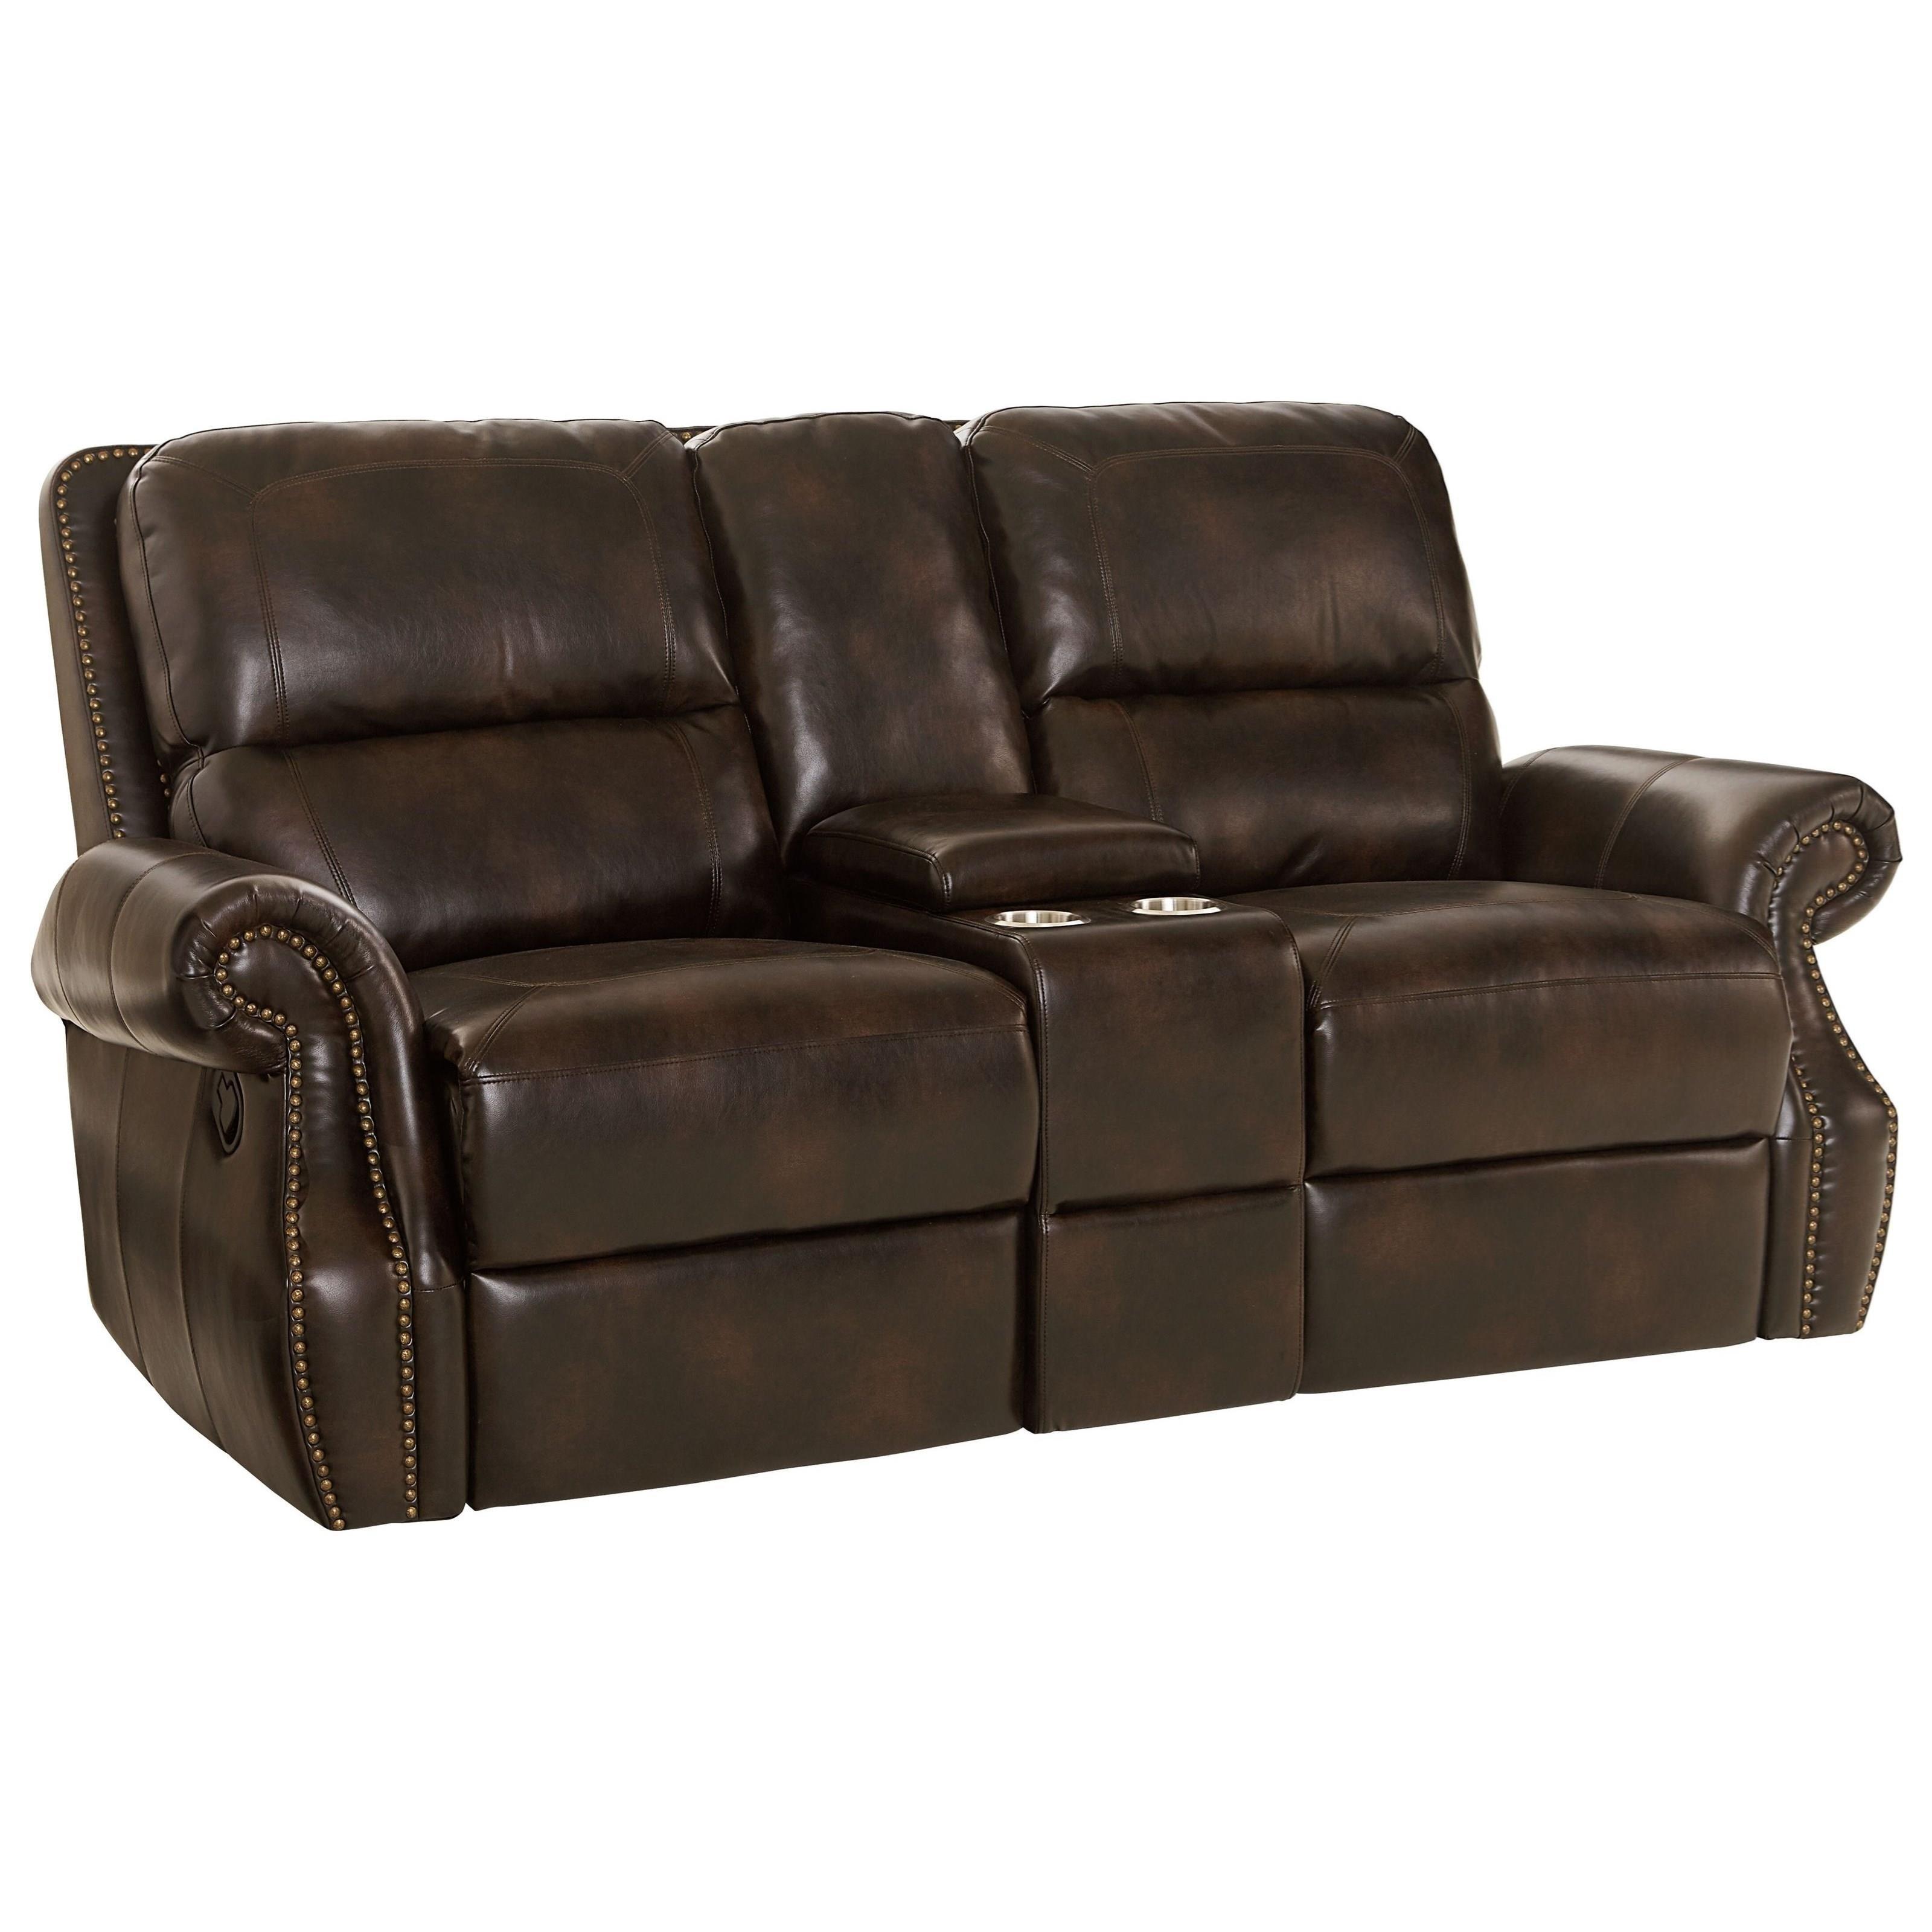 Standard Furniture Kingston Traditional Reclining Love